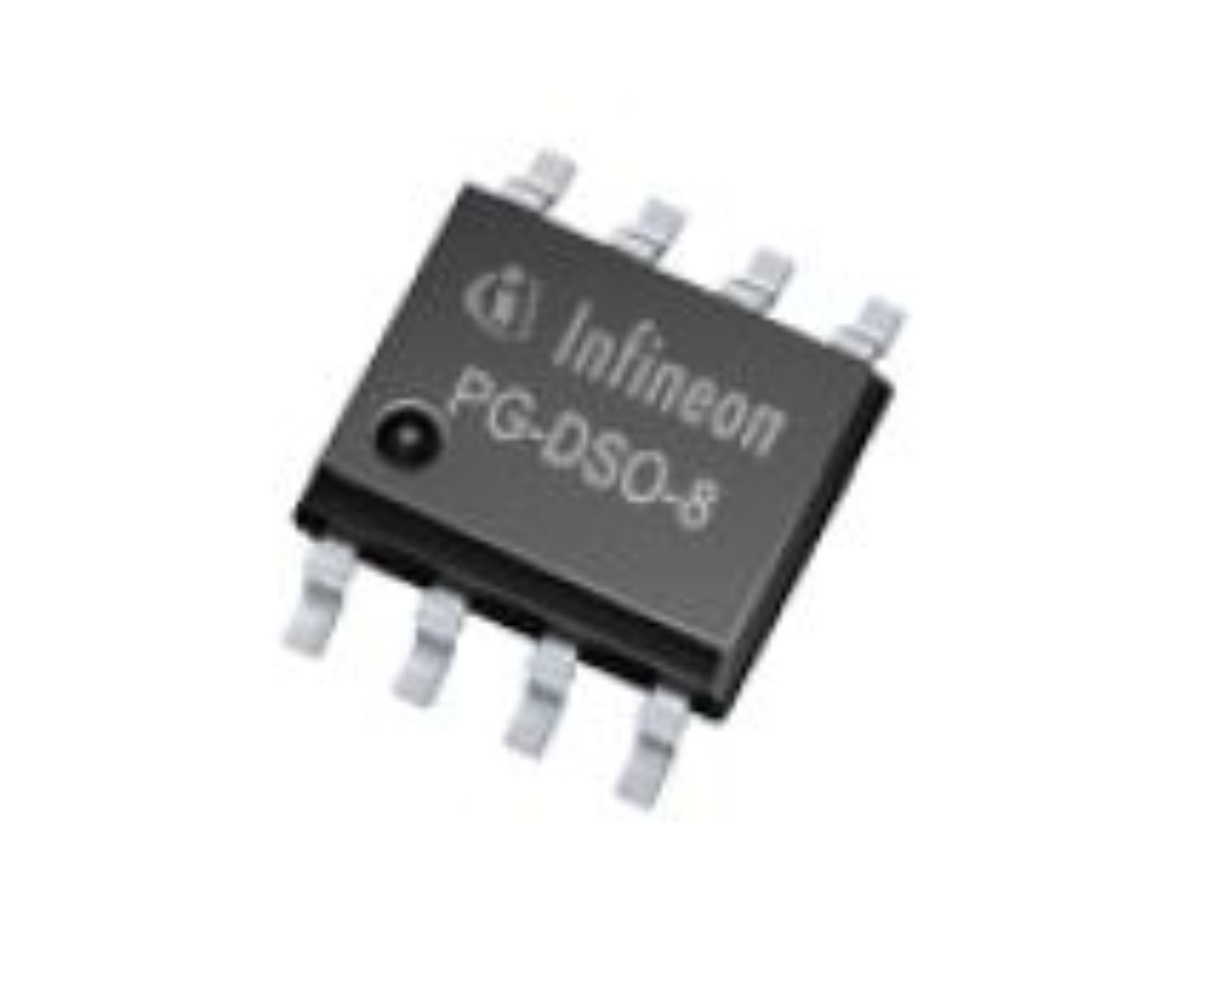 Tld1211sj Infineon Technologies Input And Output Coupling Bipolar Junction Transistors Electronics 01 00 2015 02 19 Pdf 14 Mb